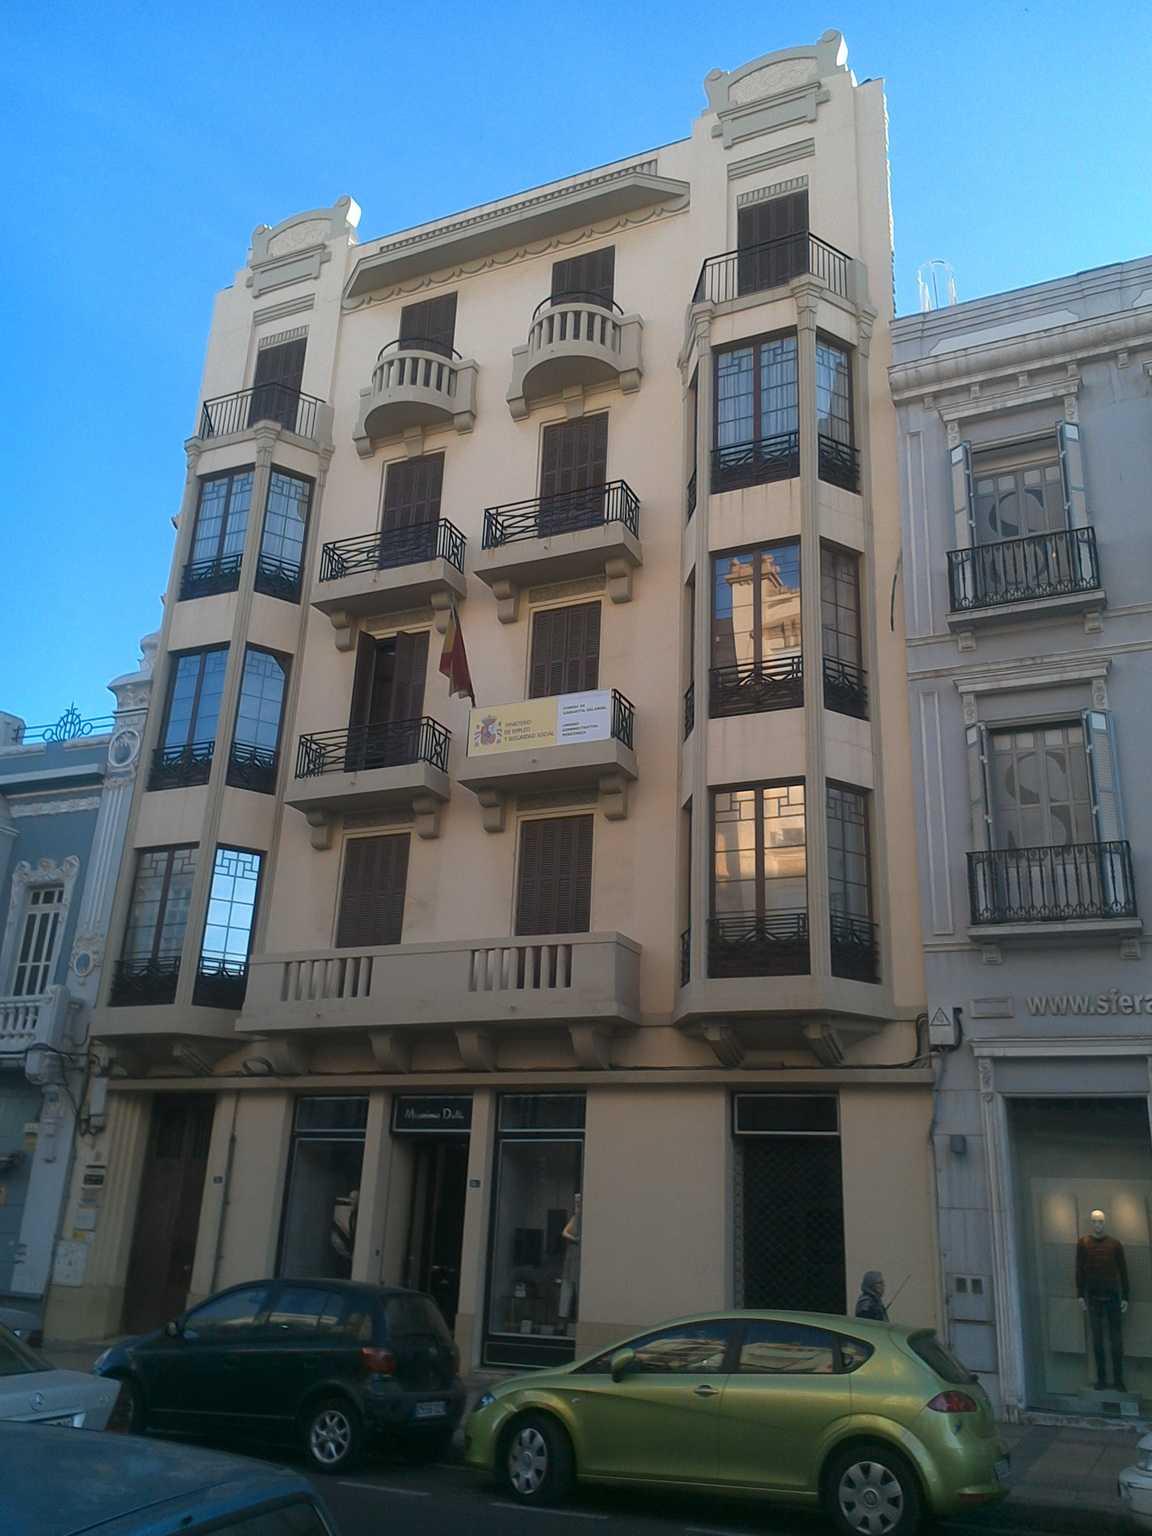 Casa de Jacques EskEnazi Aguilerun (avenida Juan Carlos I, Rey, 11)